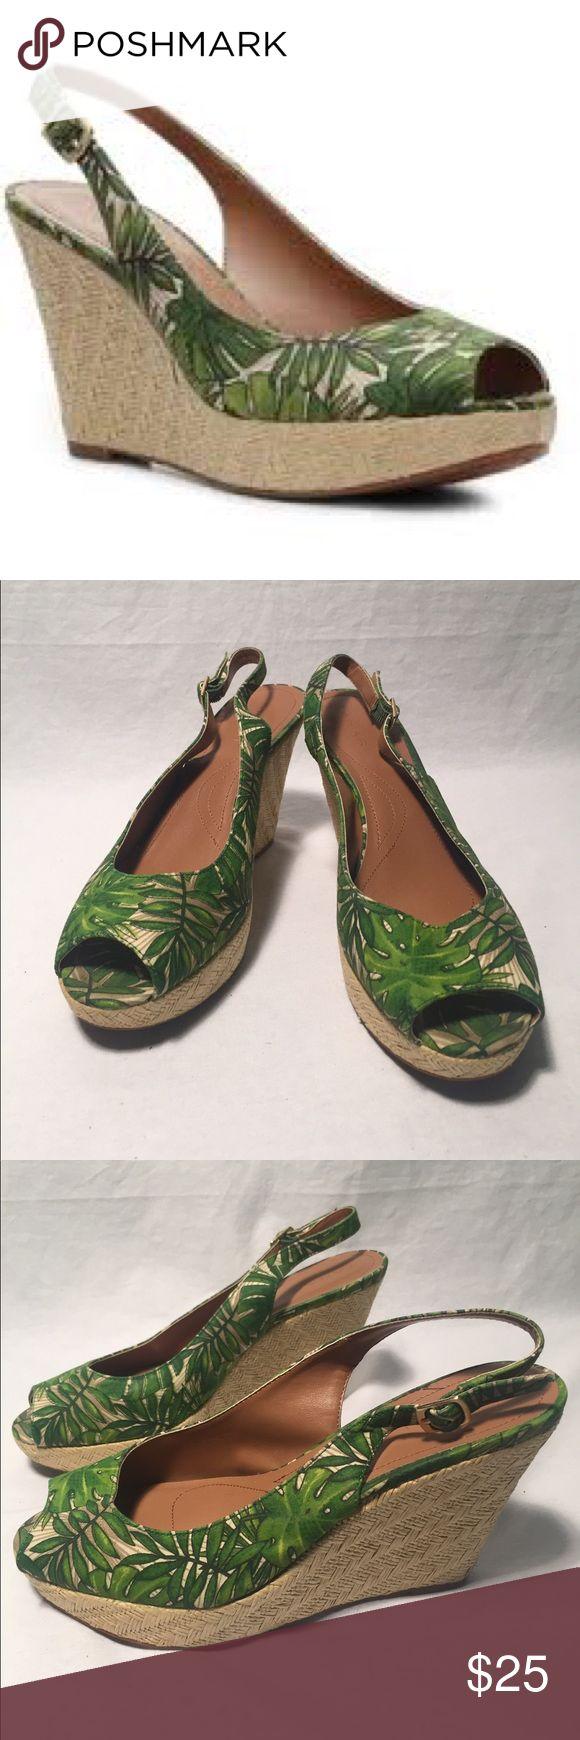 Tahari Taylor Slingback Green Wedges Fun and tropical banana leaf print. Perfect vacation shoes! Worn once! Tahari Shoes Wedges